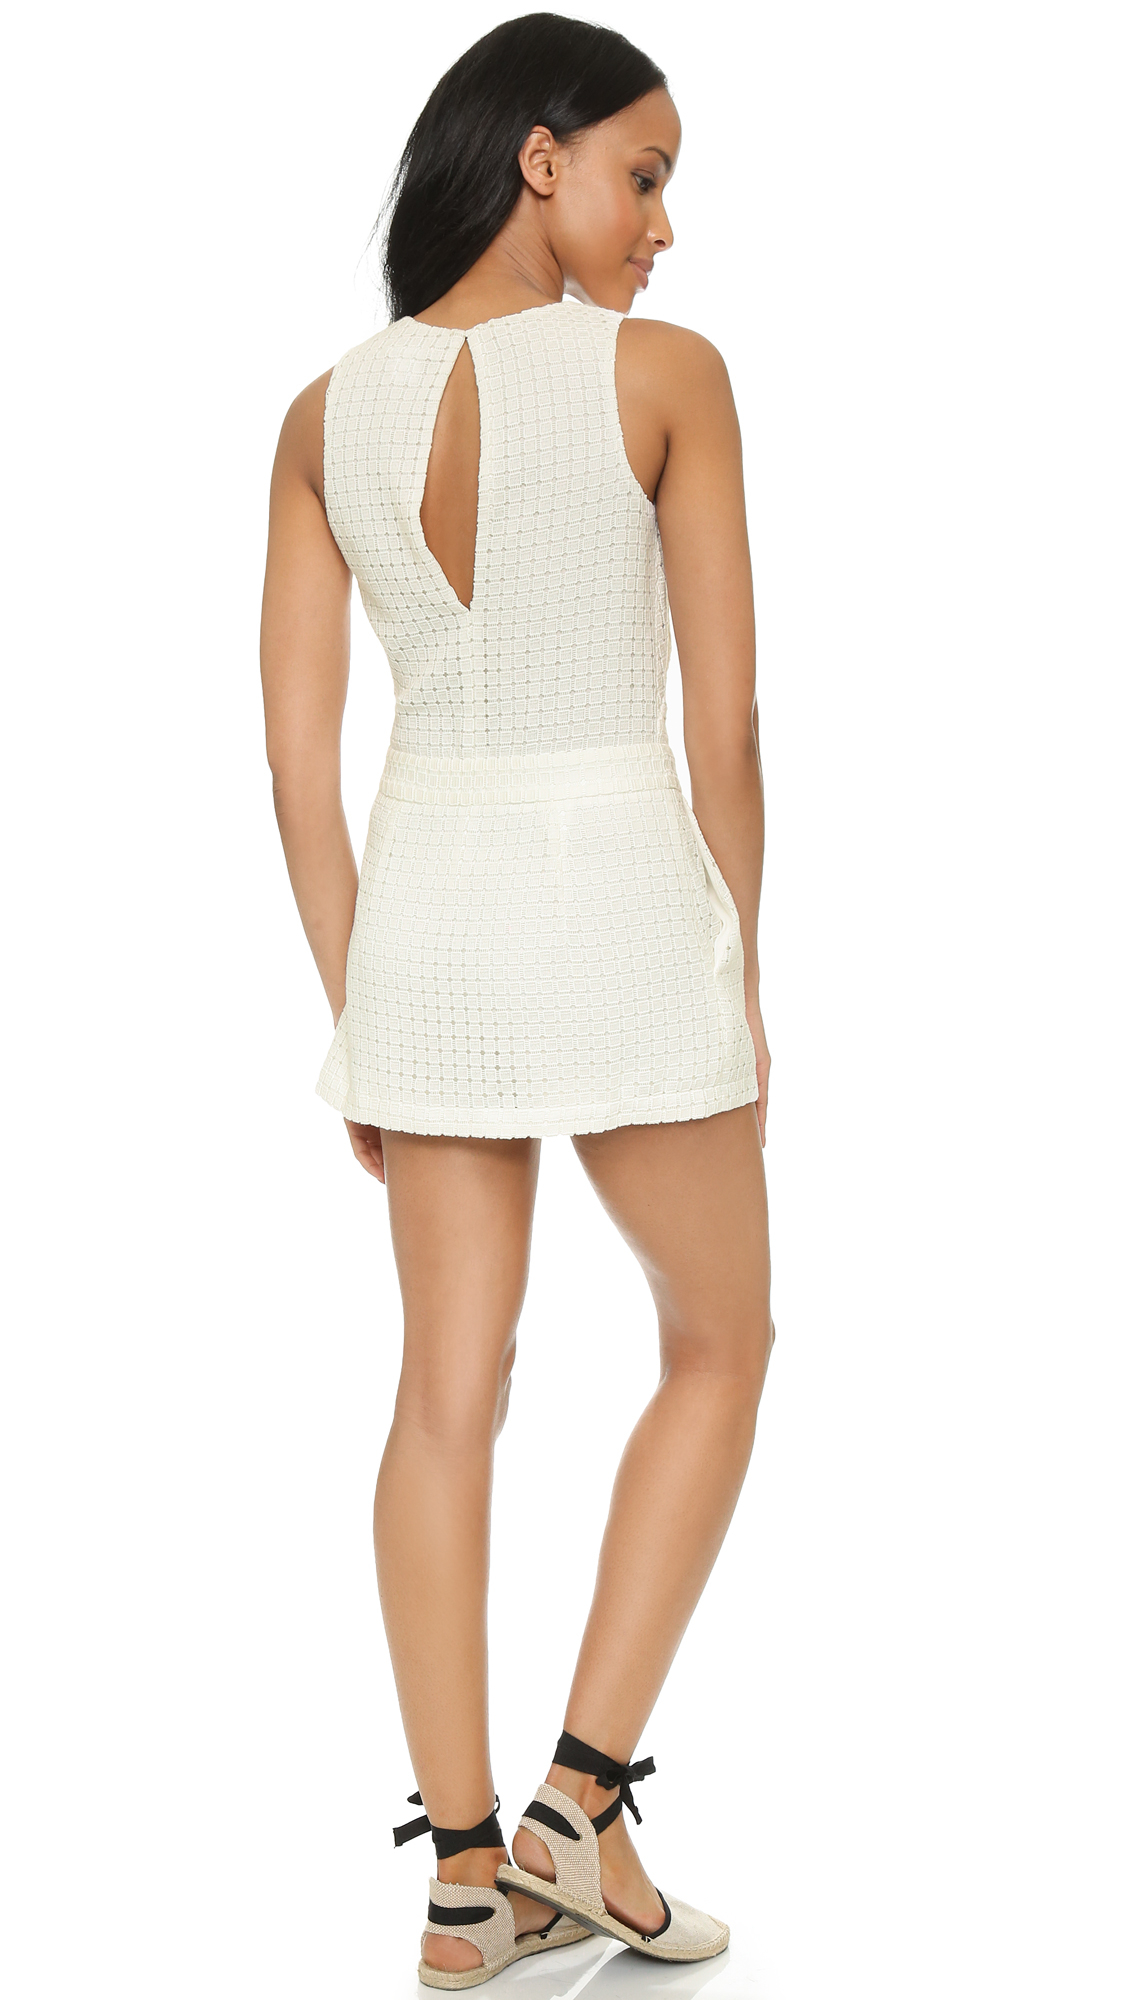 353988172088 Lyst - Club Monaco Verlise Romper in White